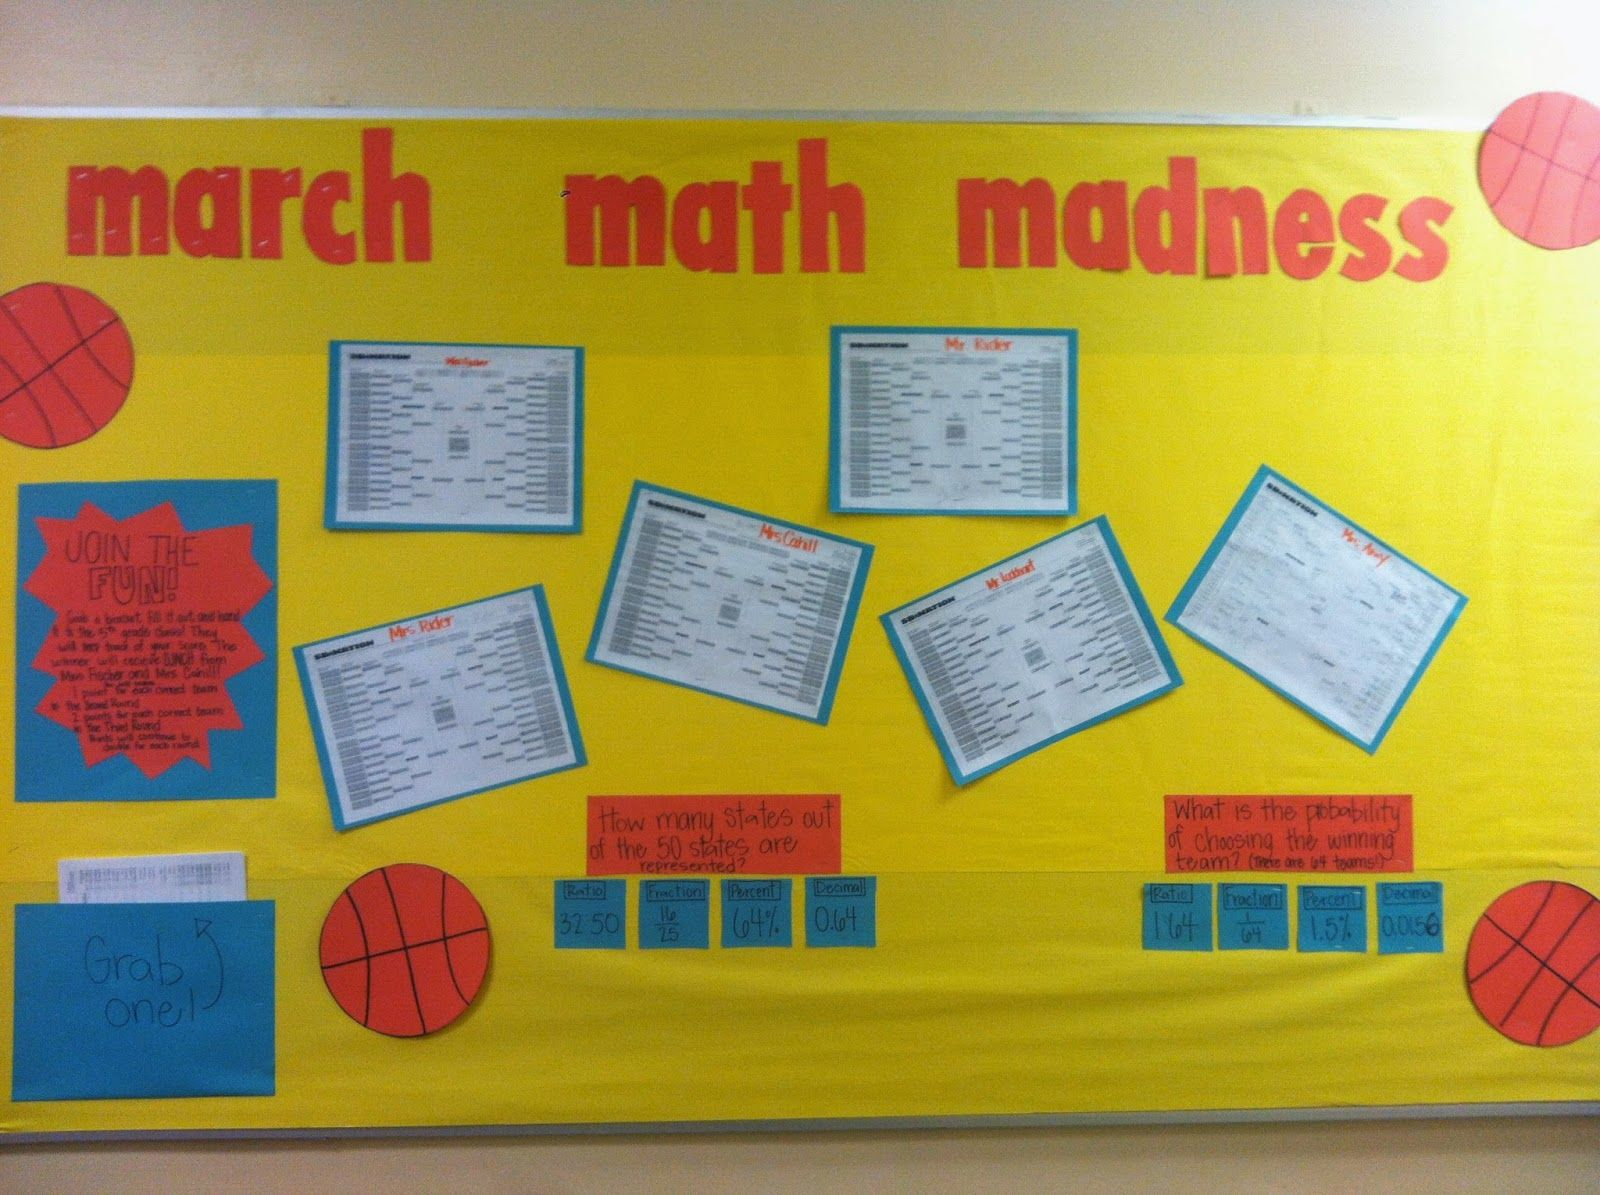 6th Grade Math Classroom Decorations ~ March math madness bulletin board for th